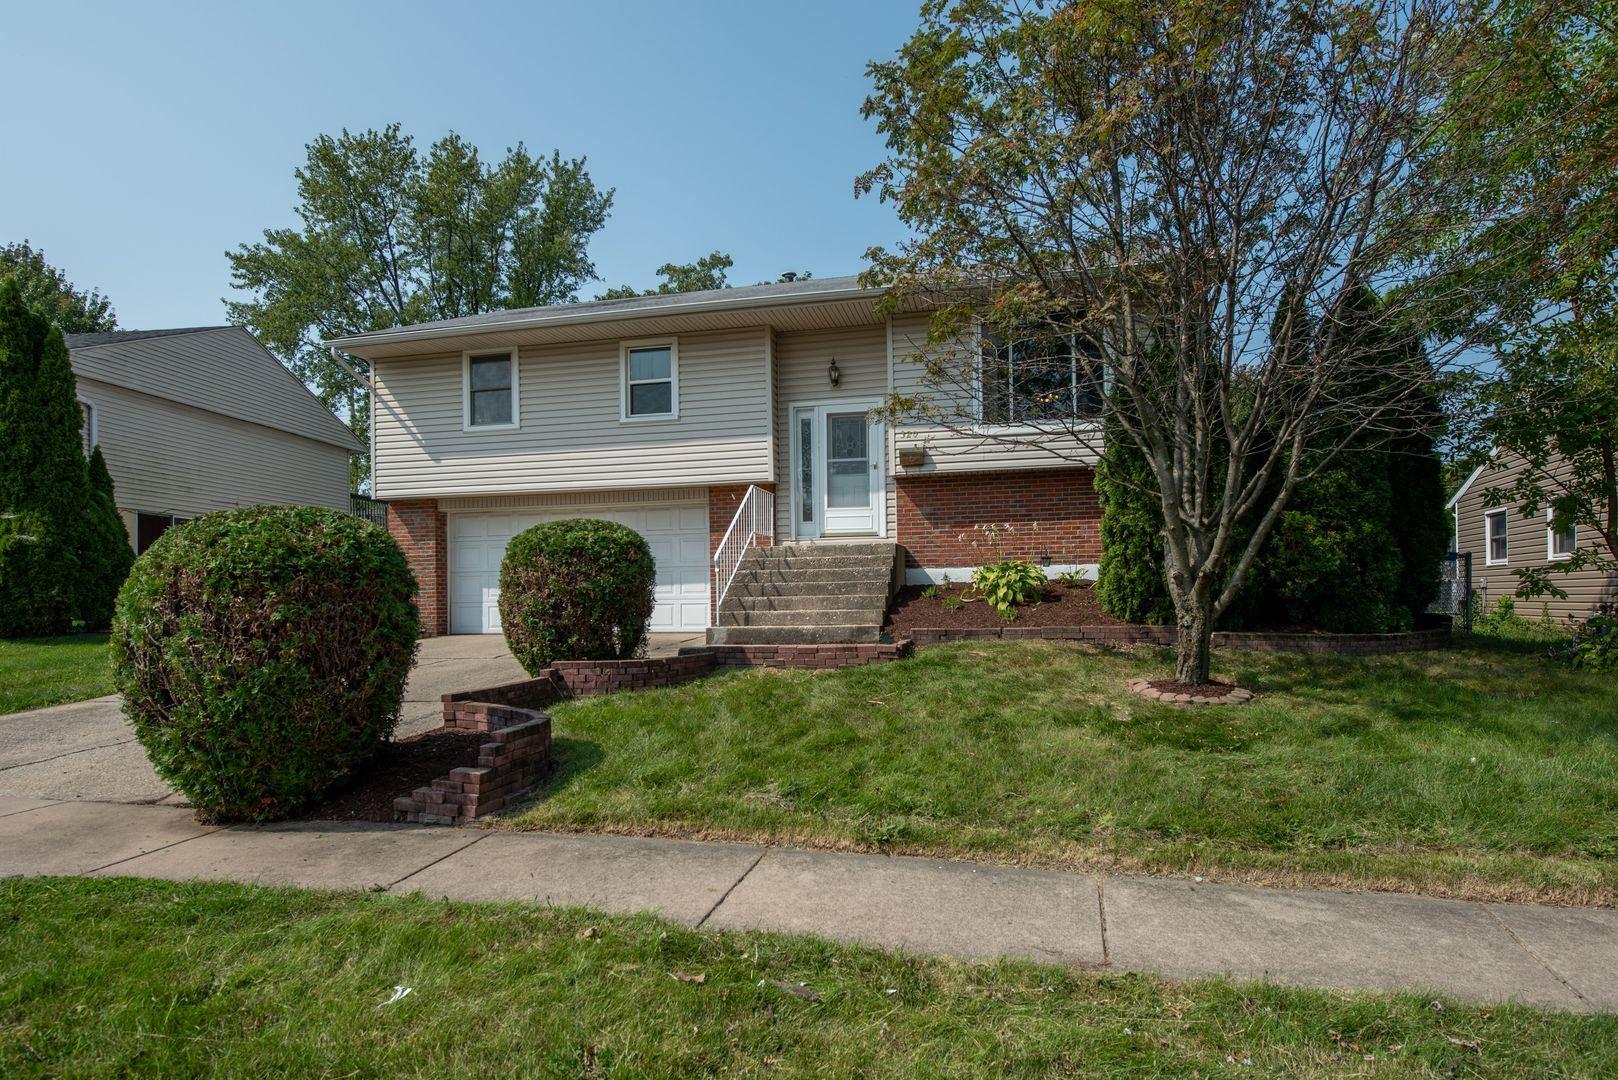 Photo of 320 Hickory Avenue, Romeoville, IL 60446 (MLS # 10884715)